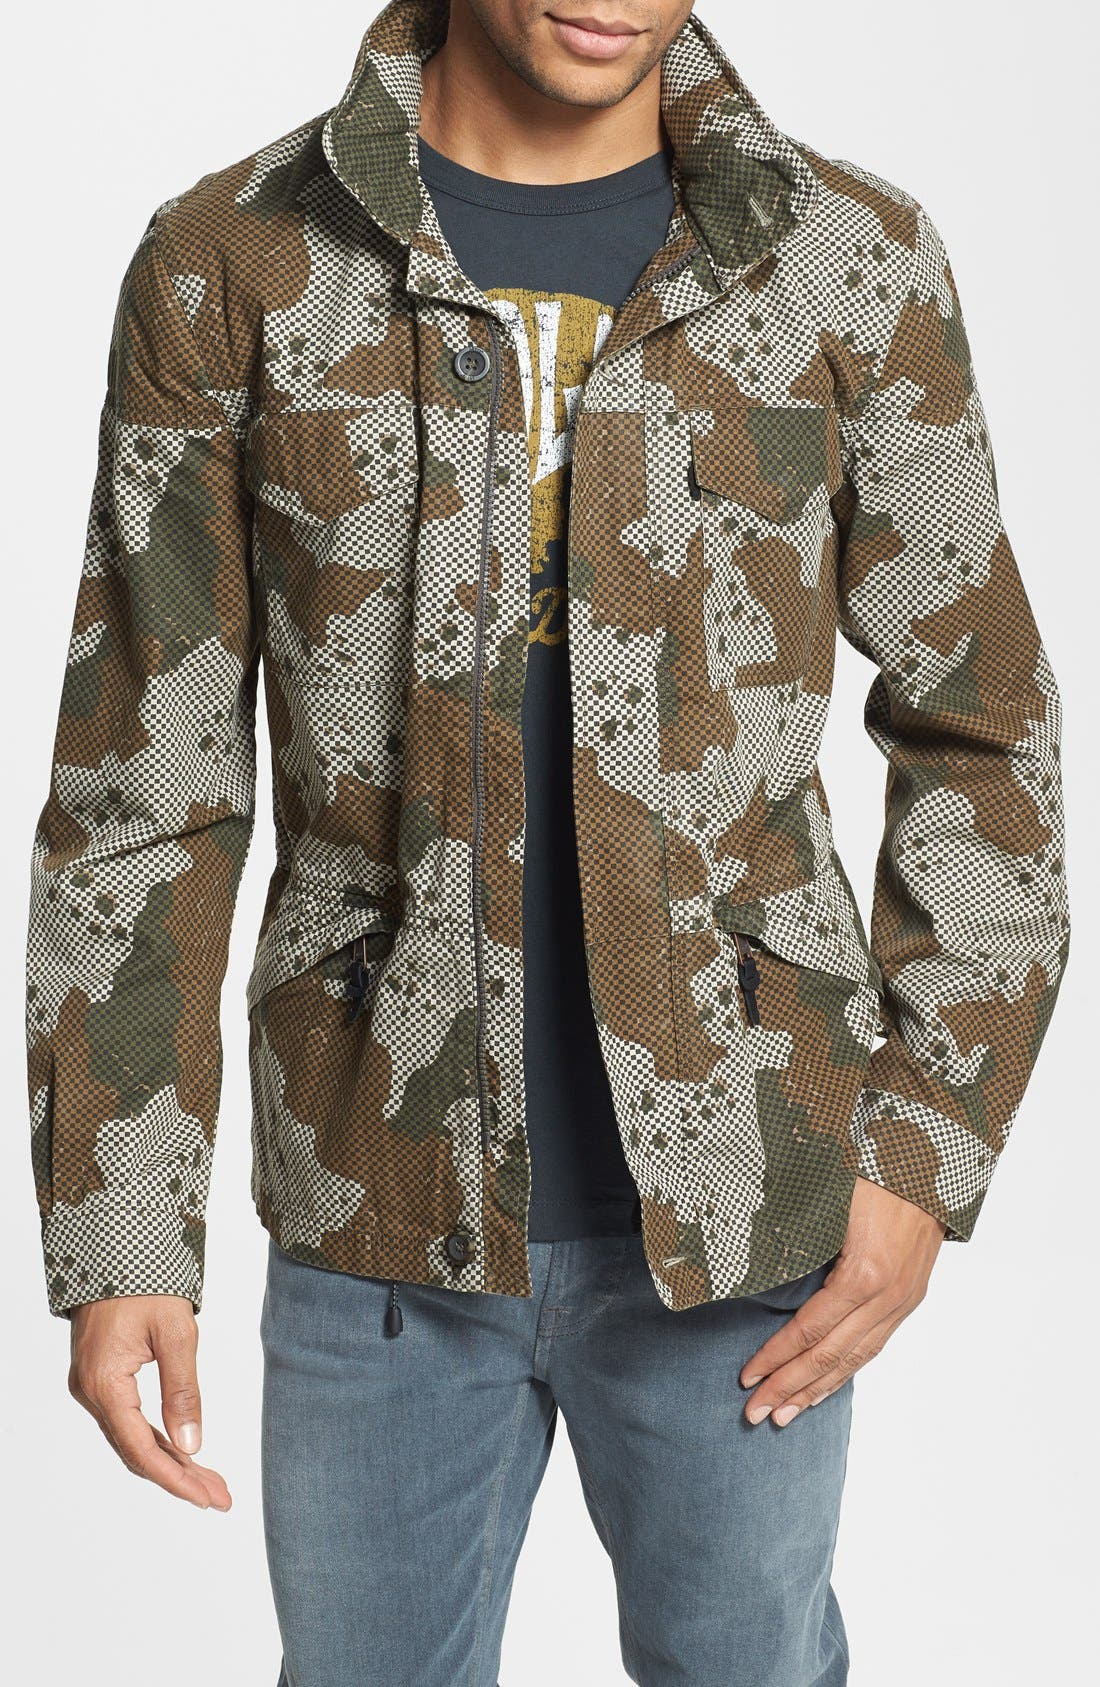 Alternate Image 1 Selected - Levi's® Check & Camo Print Field Jacket